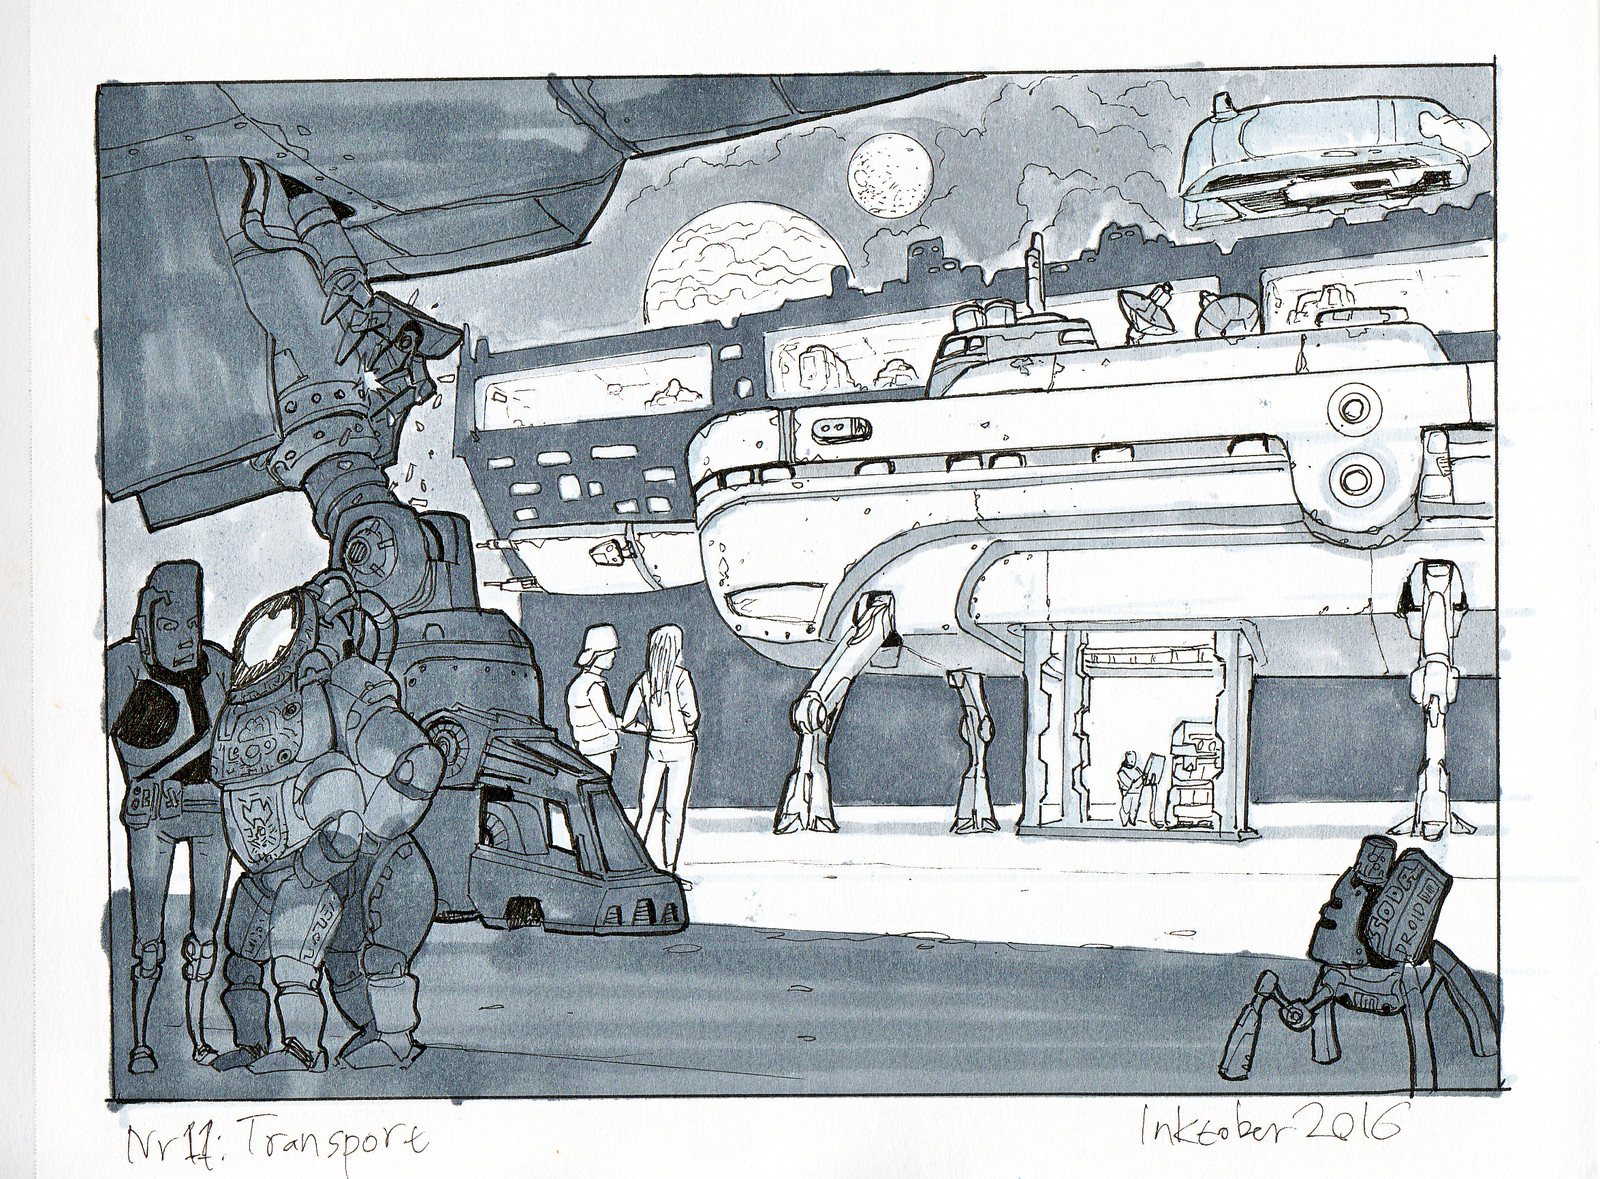 11: Transport